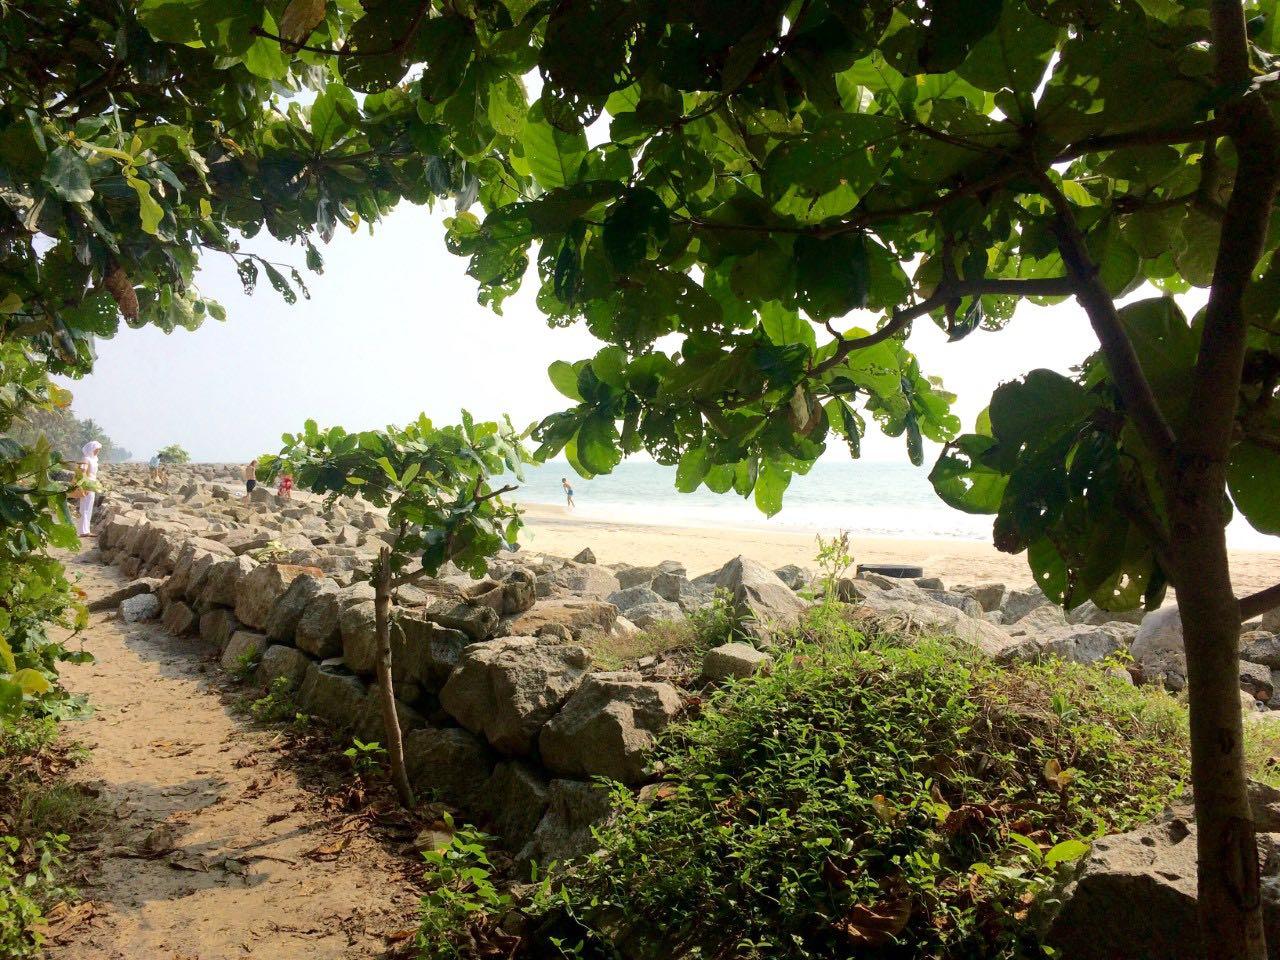 amritapuri beach, south india